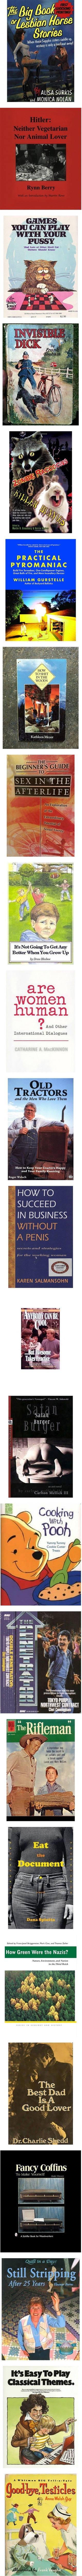 worst book covers ever. . worst book covers ever